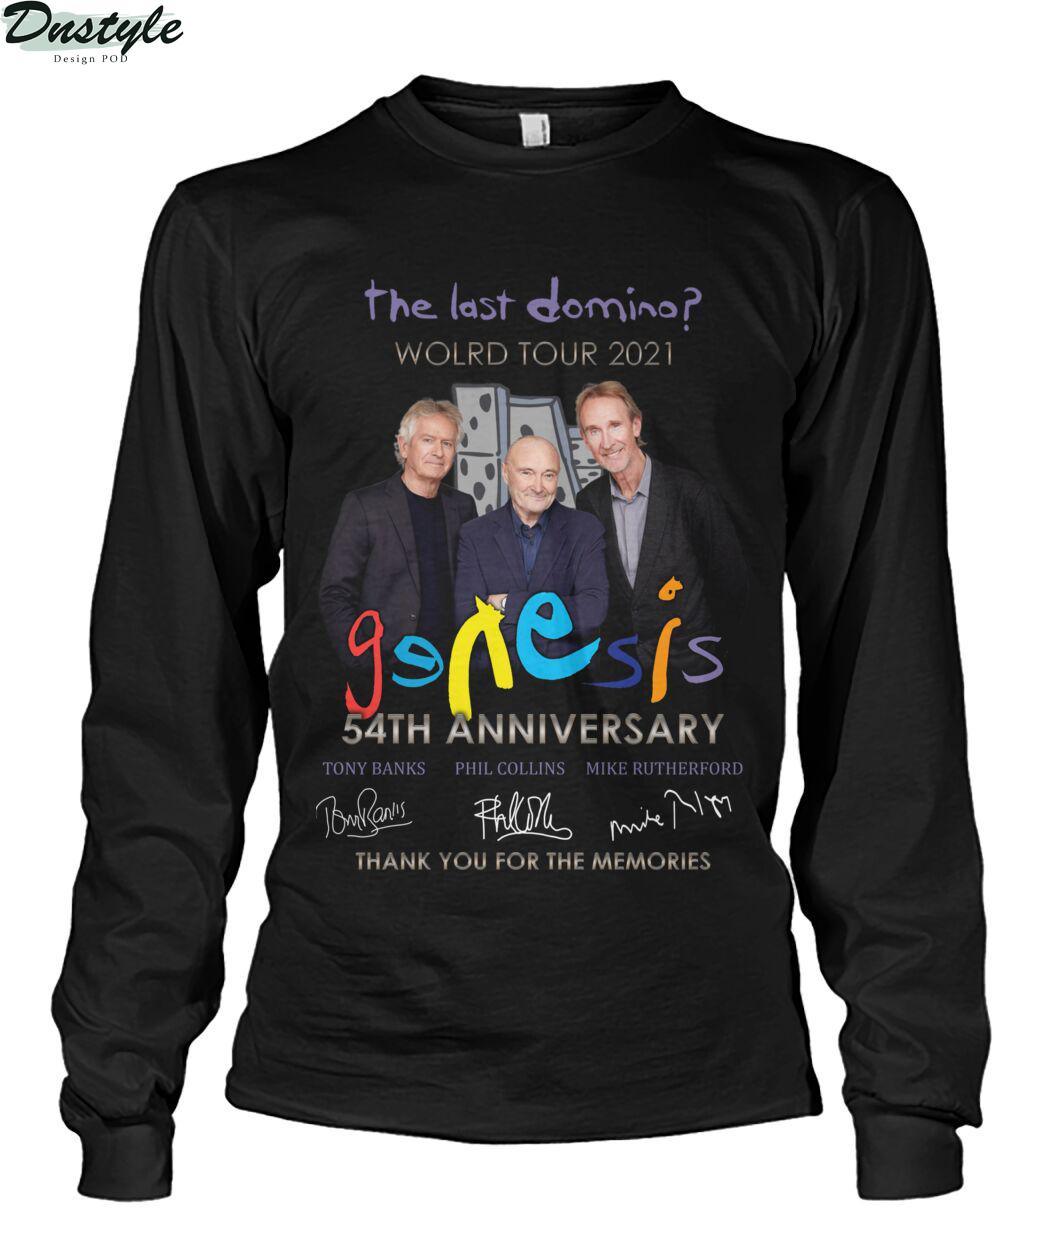 The last domino world tour 2021 Genesis 54th anniversary long sleeve